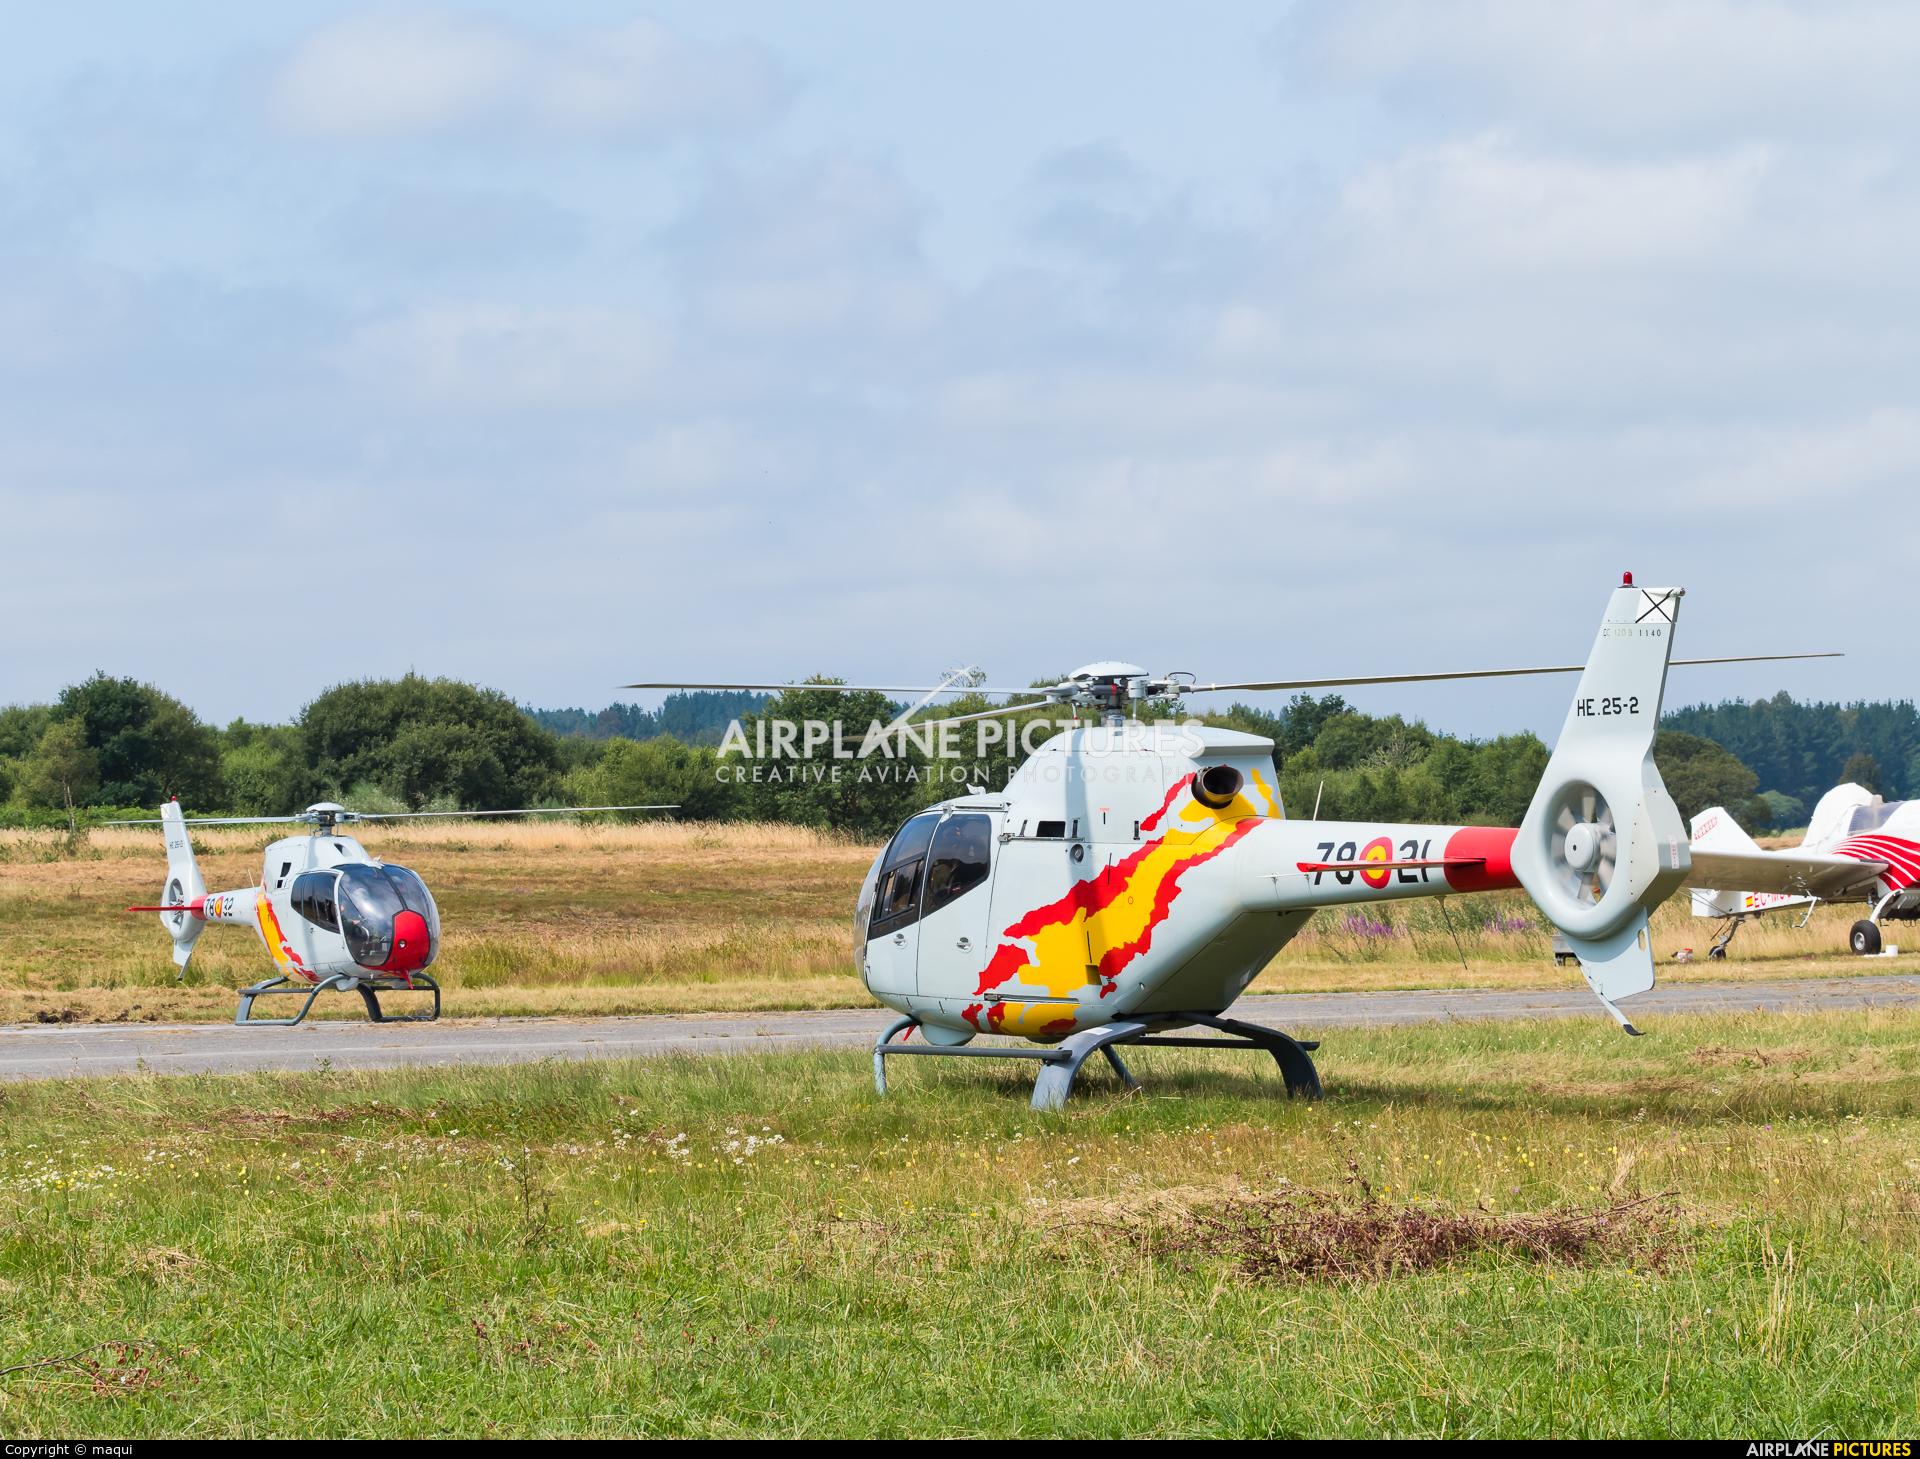 Spain - Air Force: Patrulla ASPA HE.25-2 aircraft at Lugo - Rozas